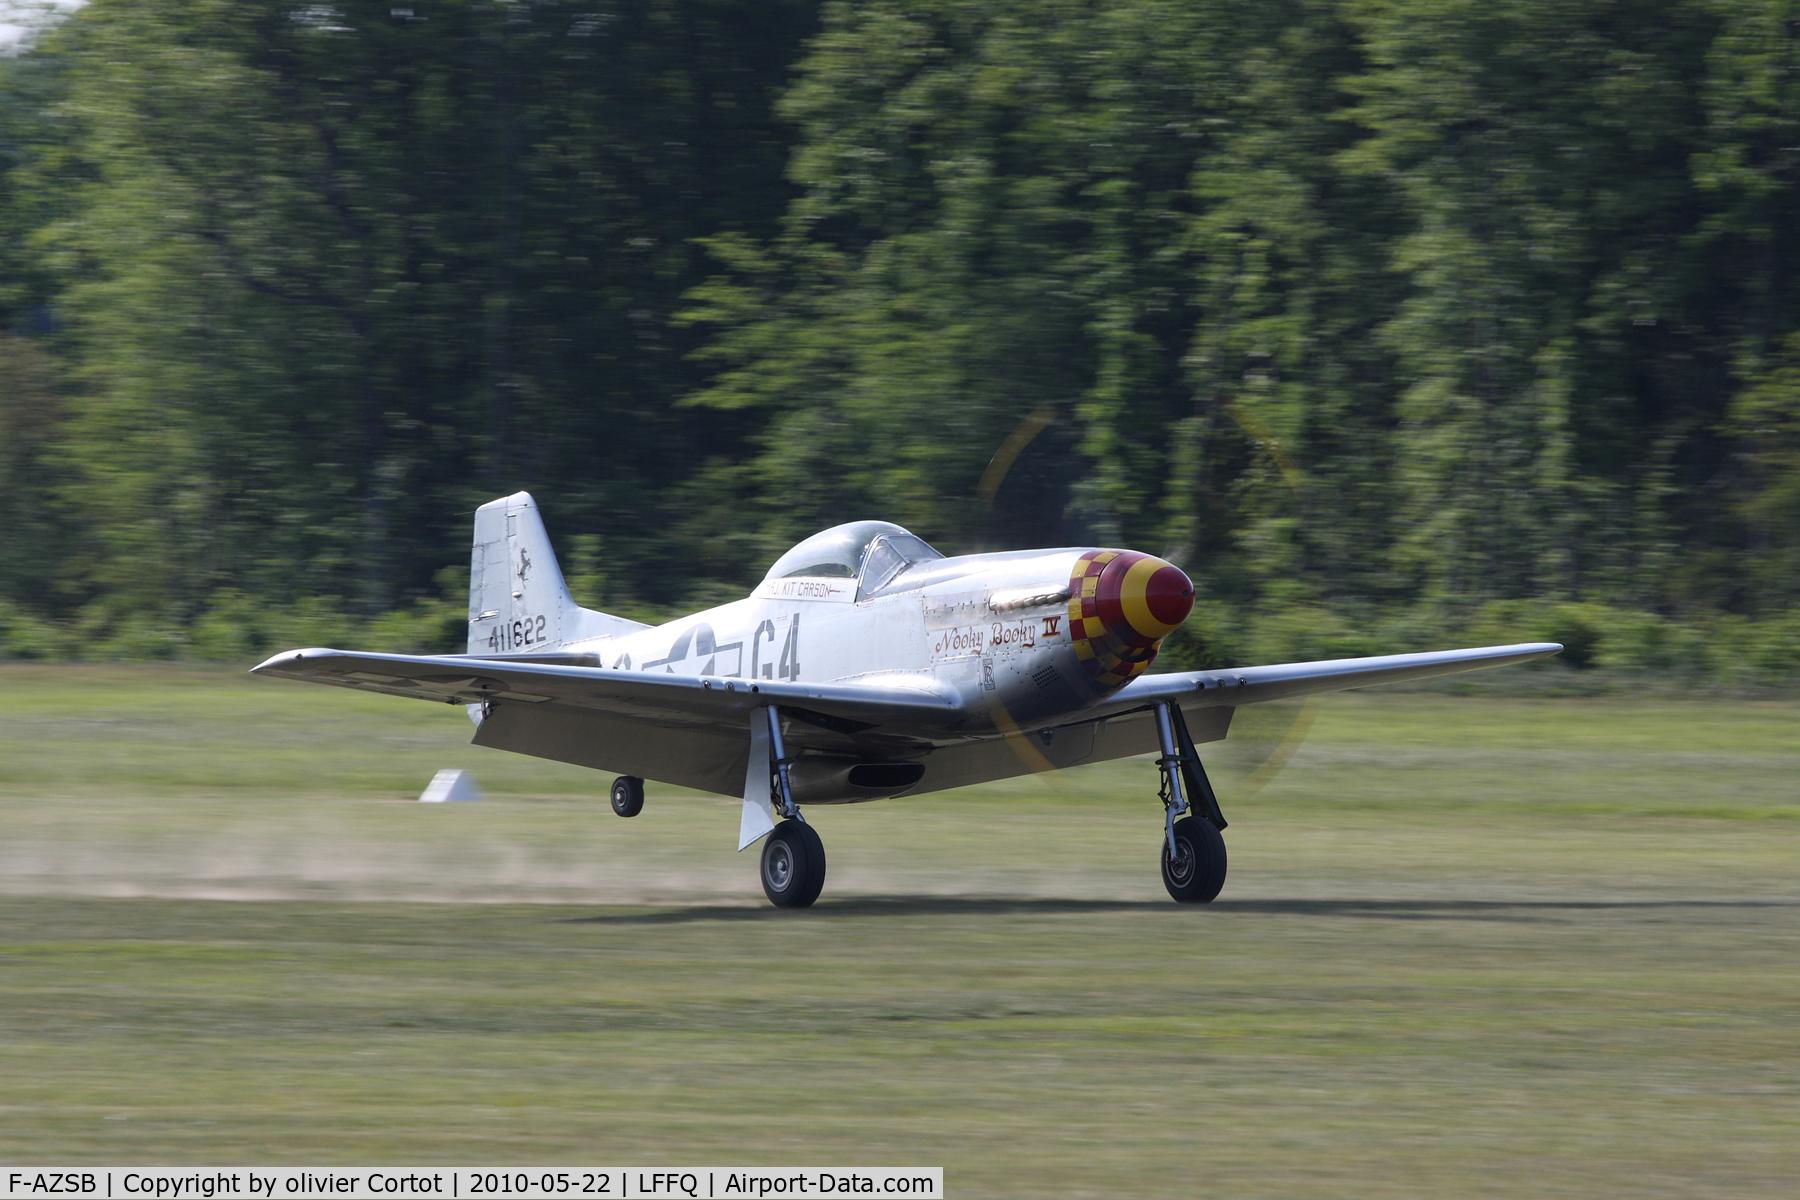 F-AZSB, 1944 North American P-51D Mustang C/N 122-40967, Ferté Alais airshow 2010